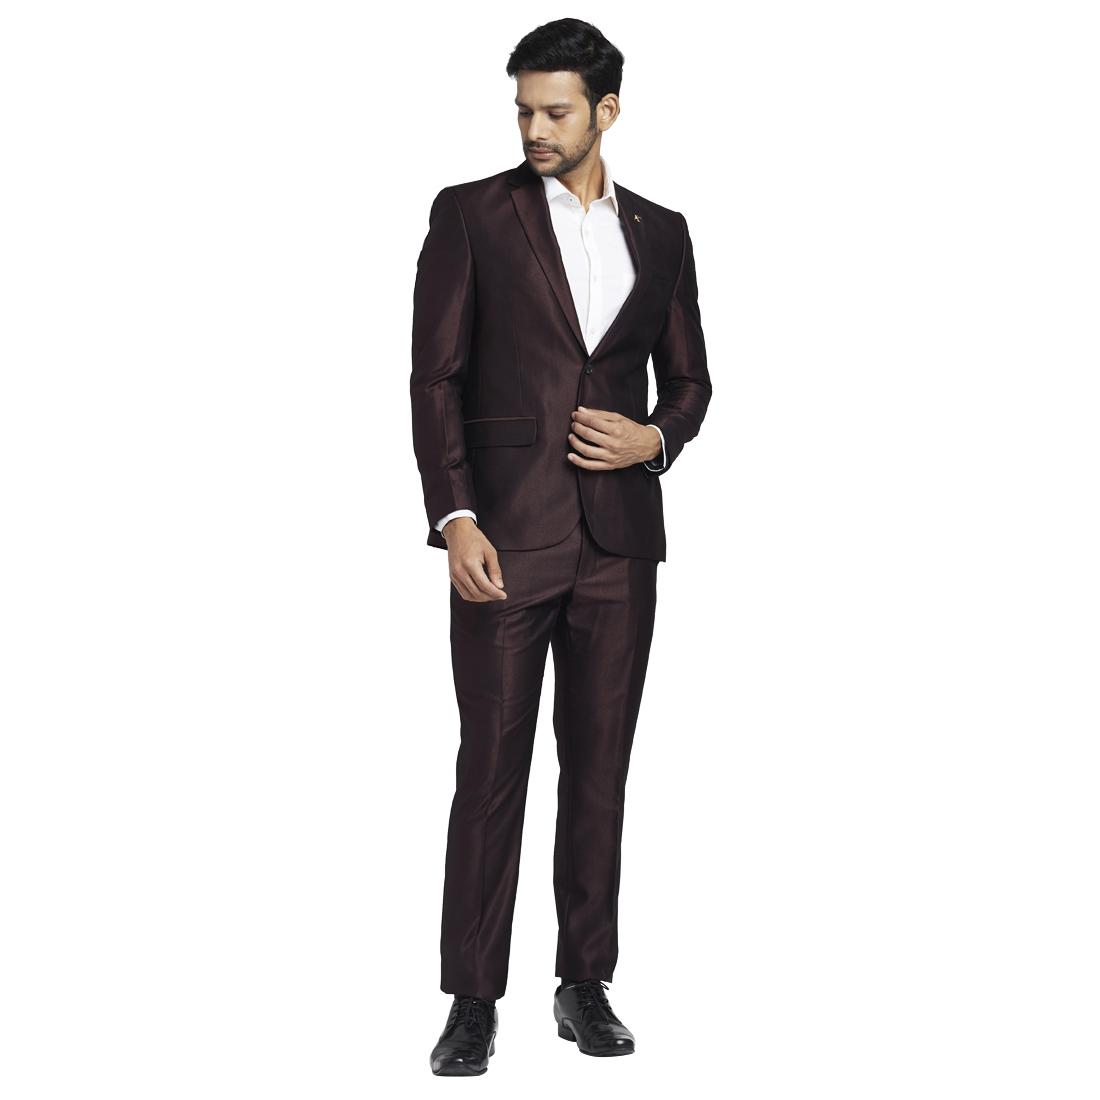 PARX | Parx Dark Maroon Suit